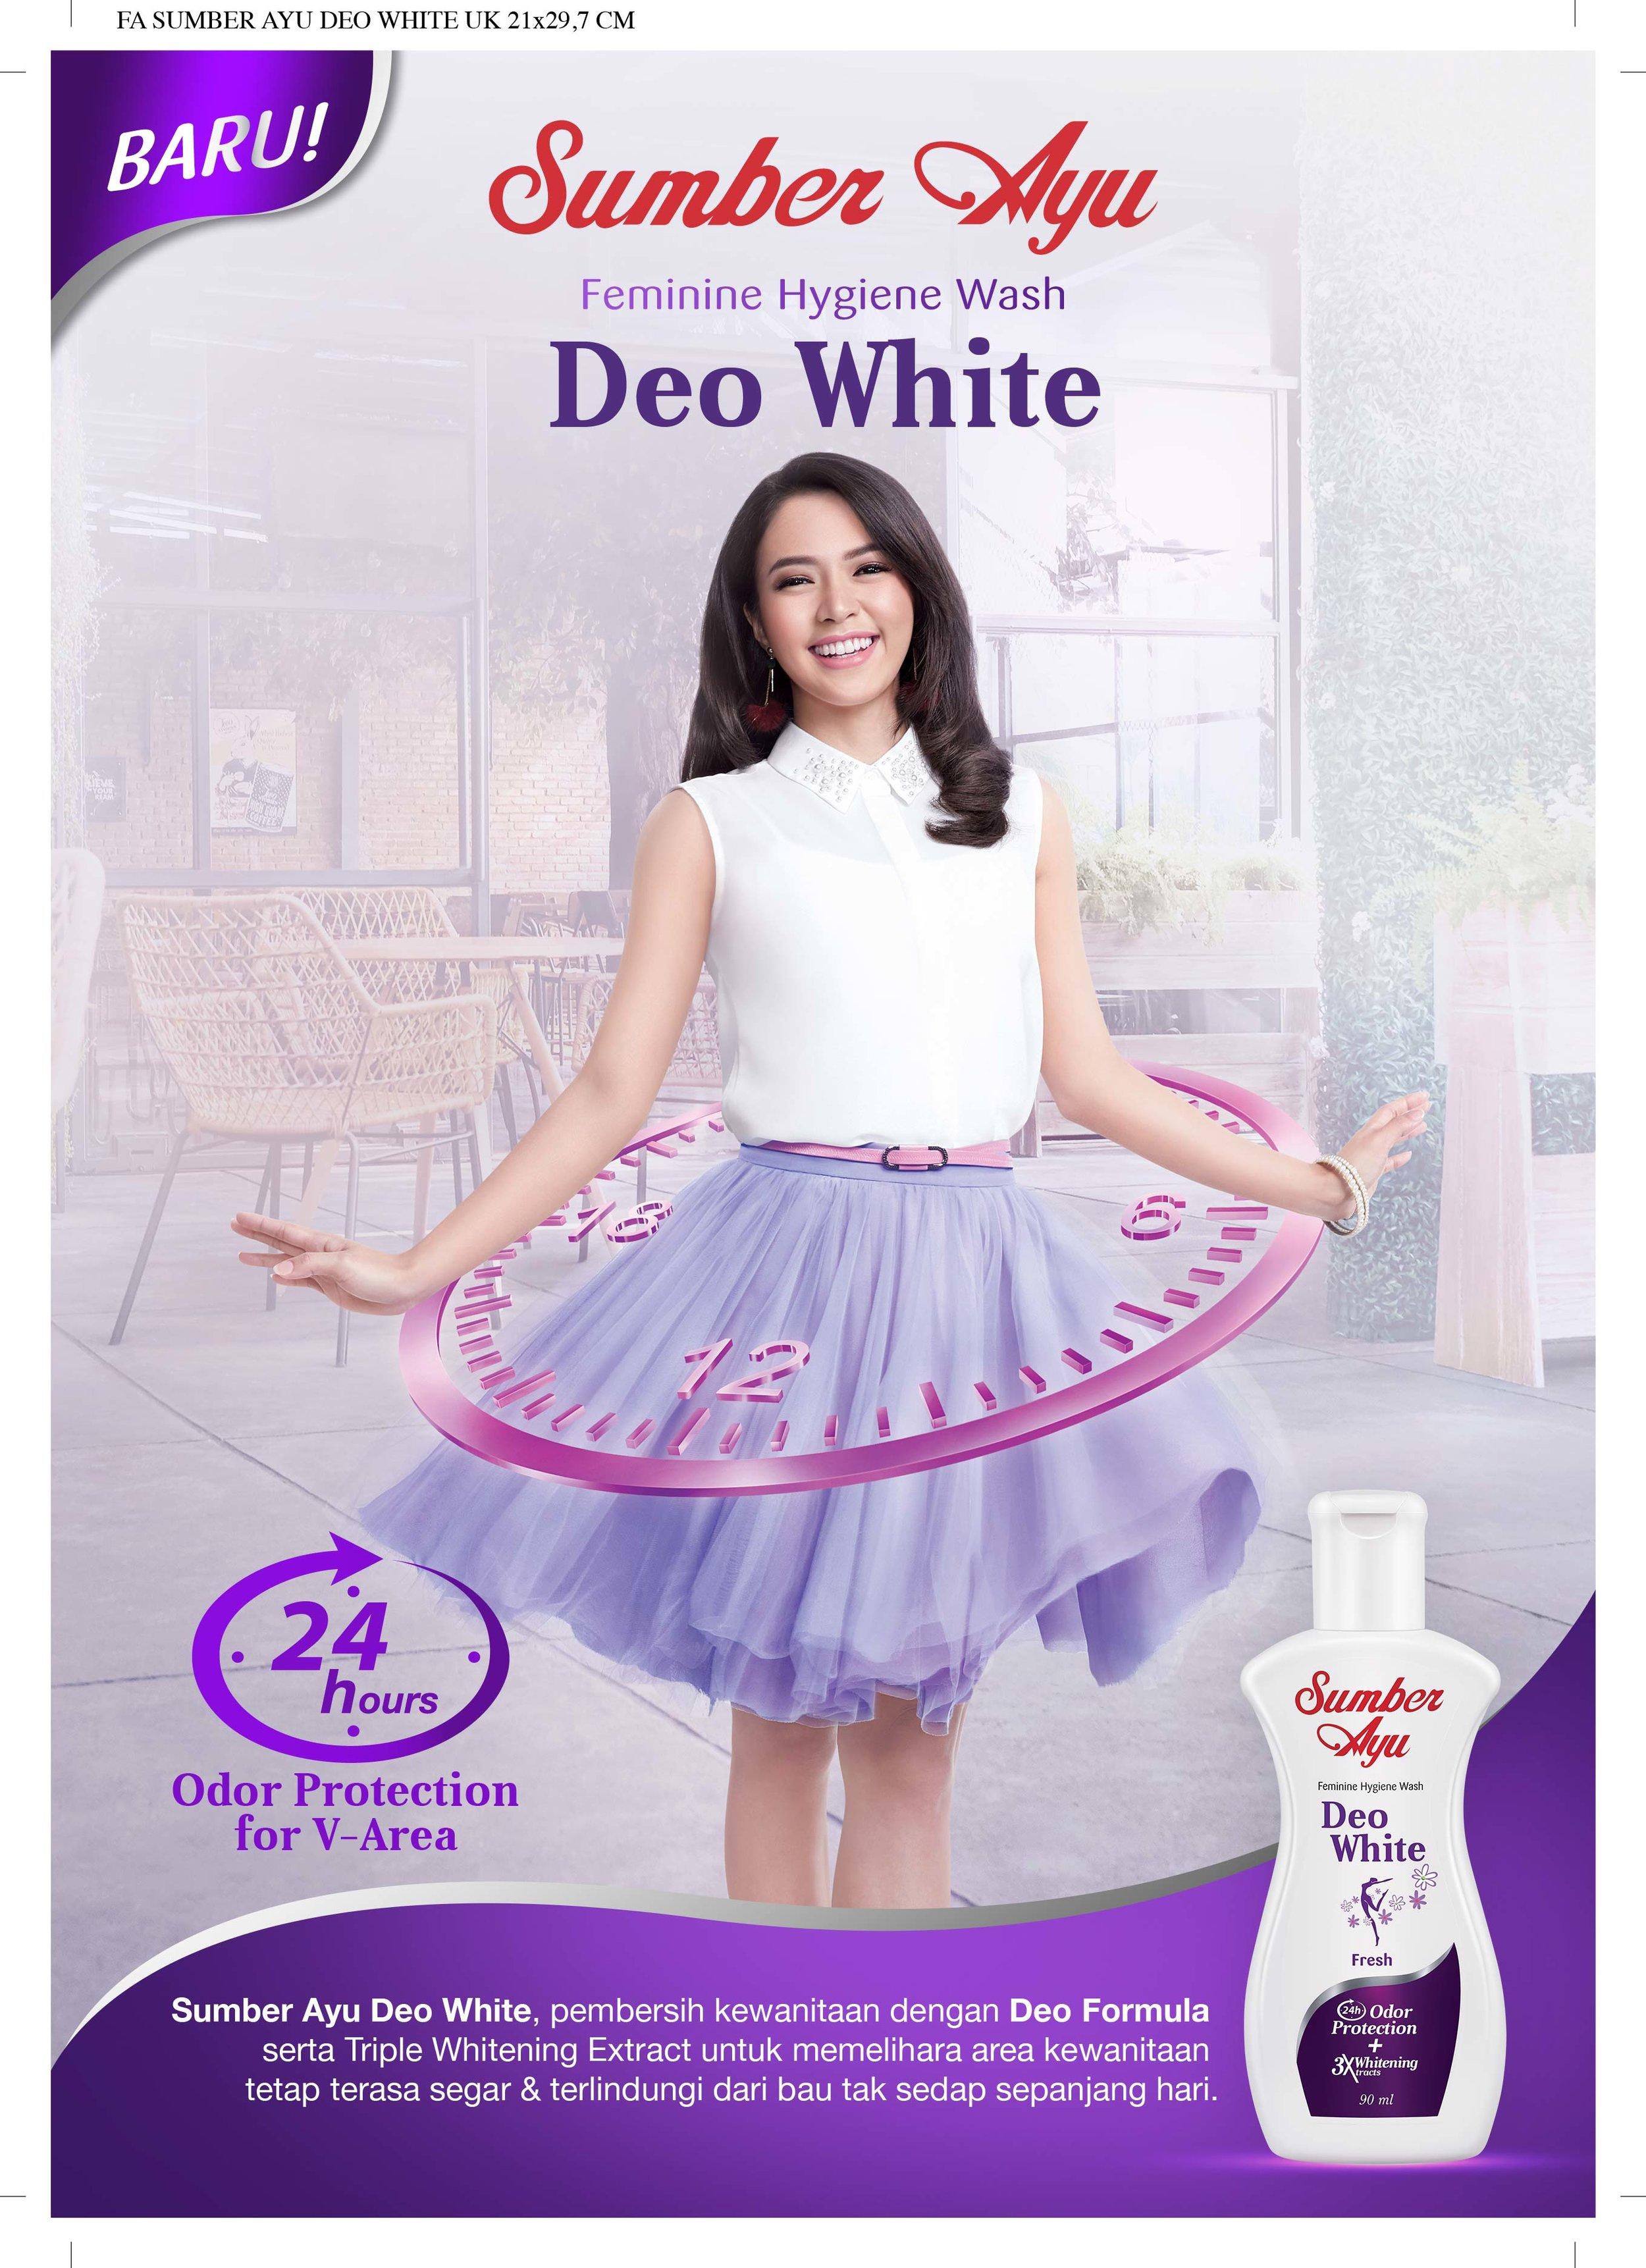 FA SA Deo White-01.jpg